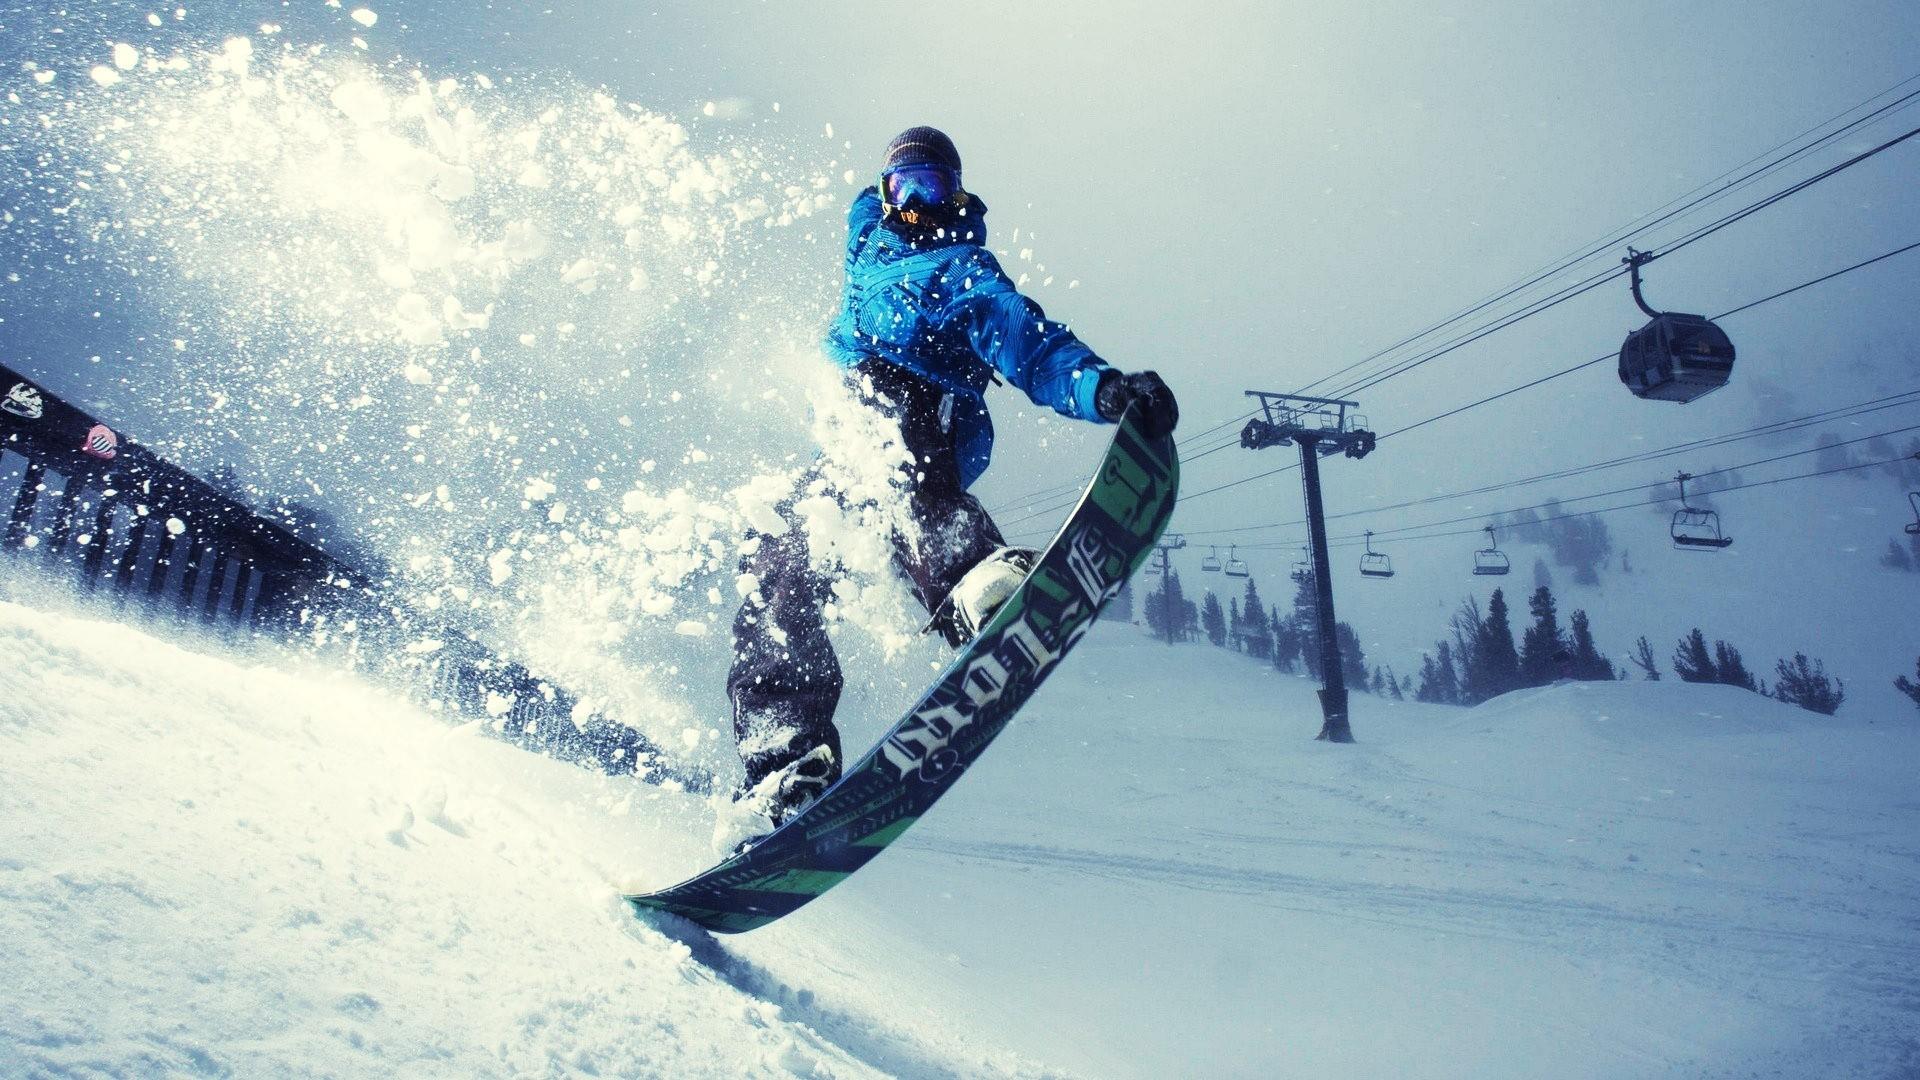 Adenture sports - Snowboarding